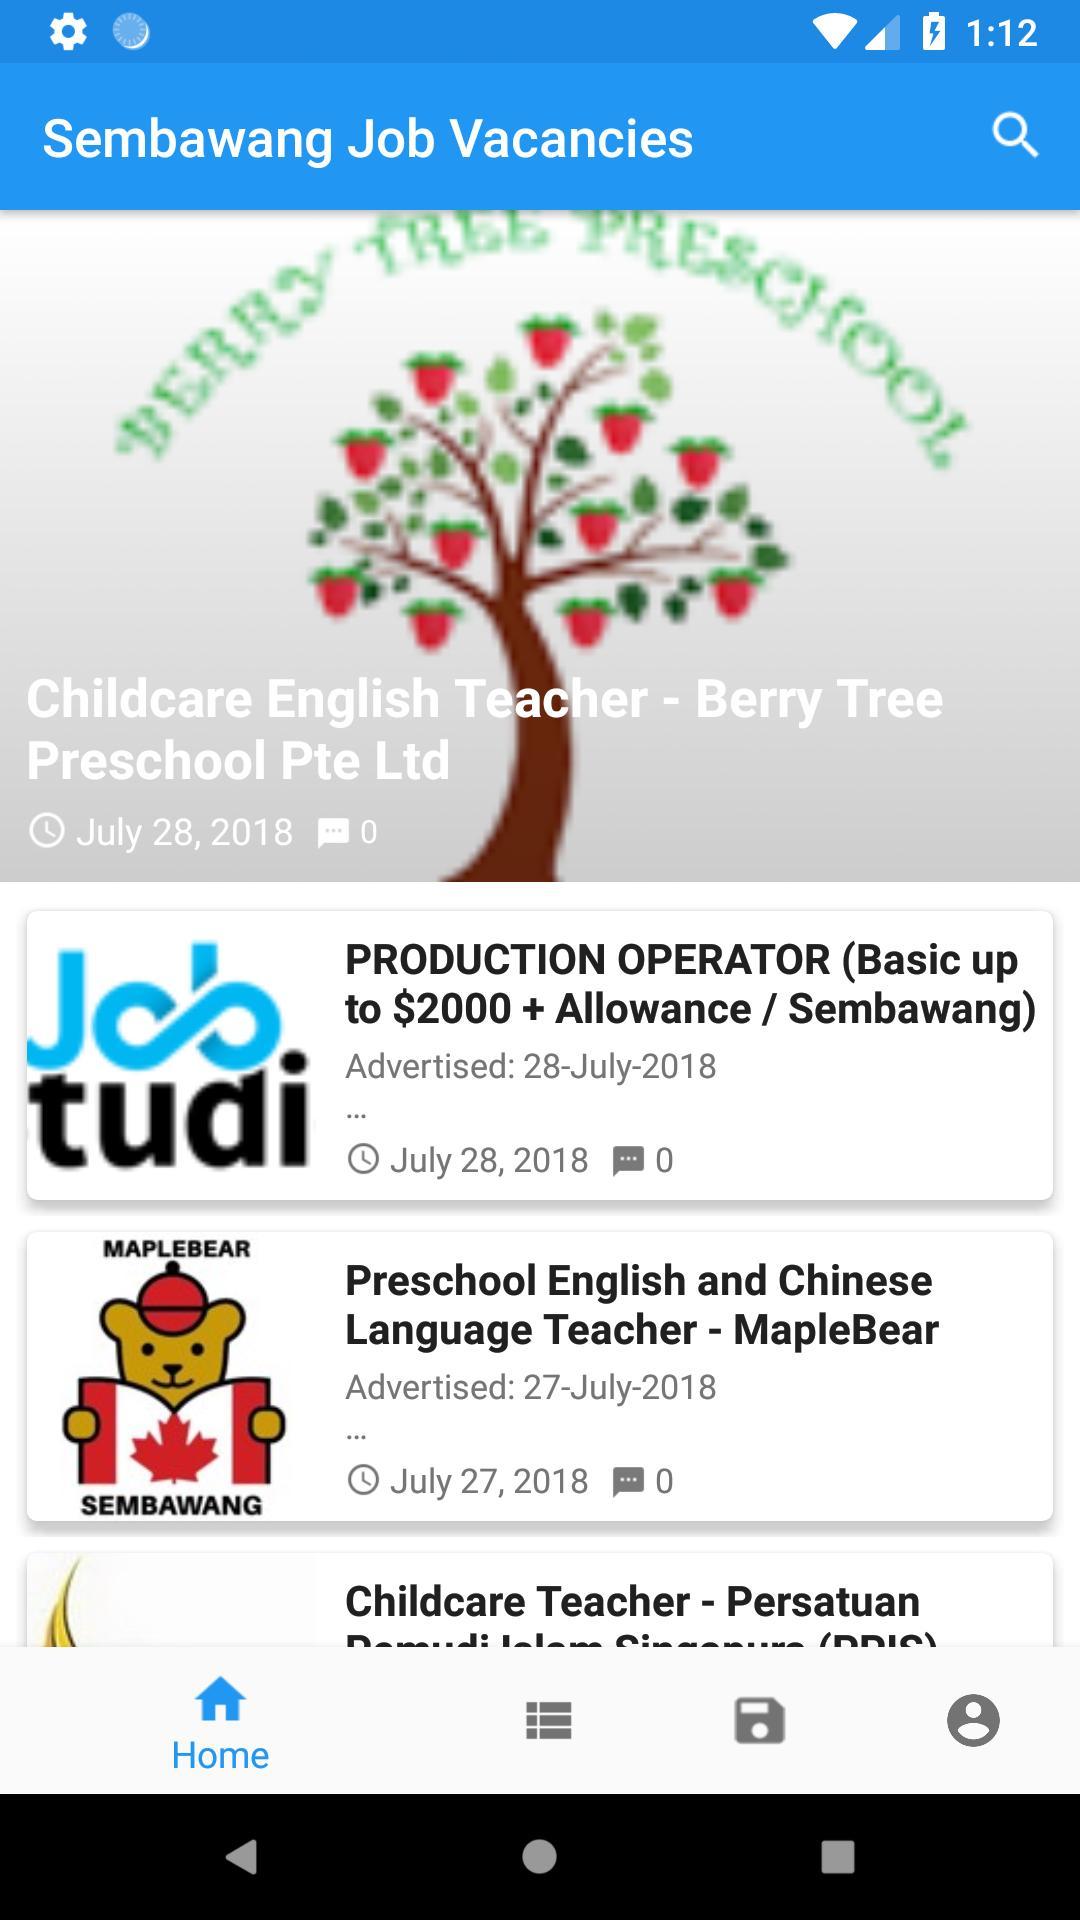 SEMBAWANG JOB VACANCIES - Daily Job Update for Android - APK Download